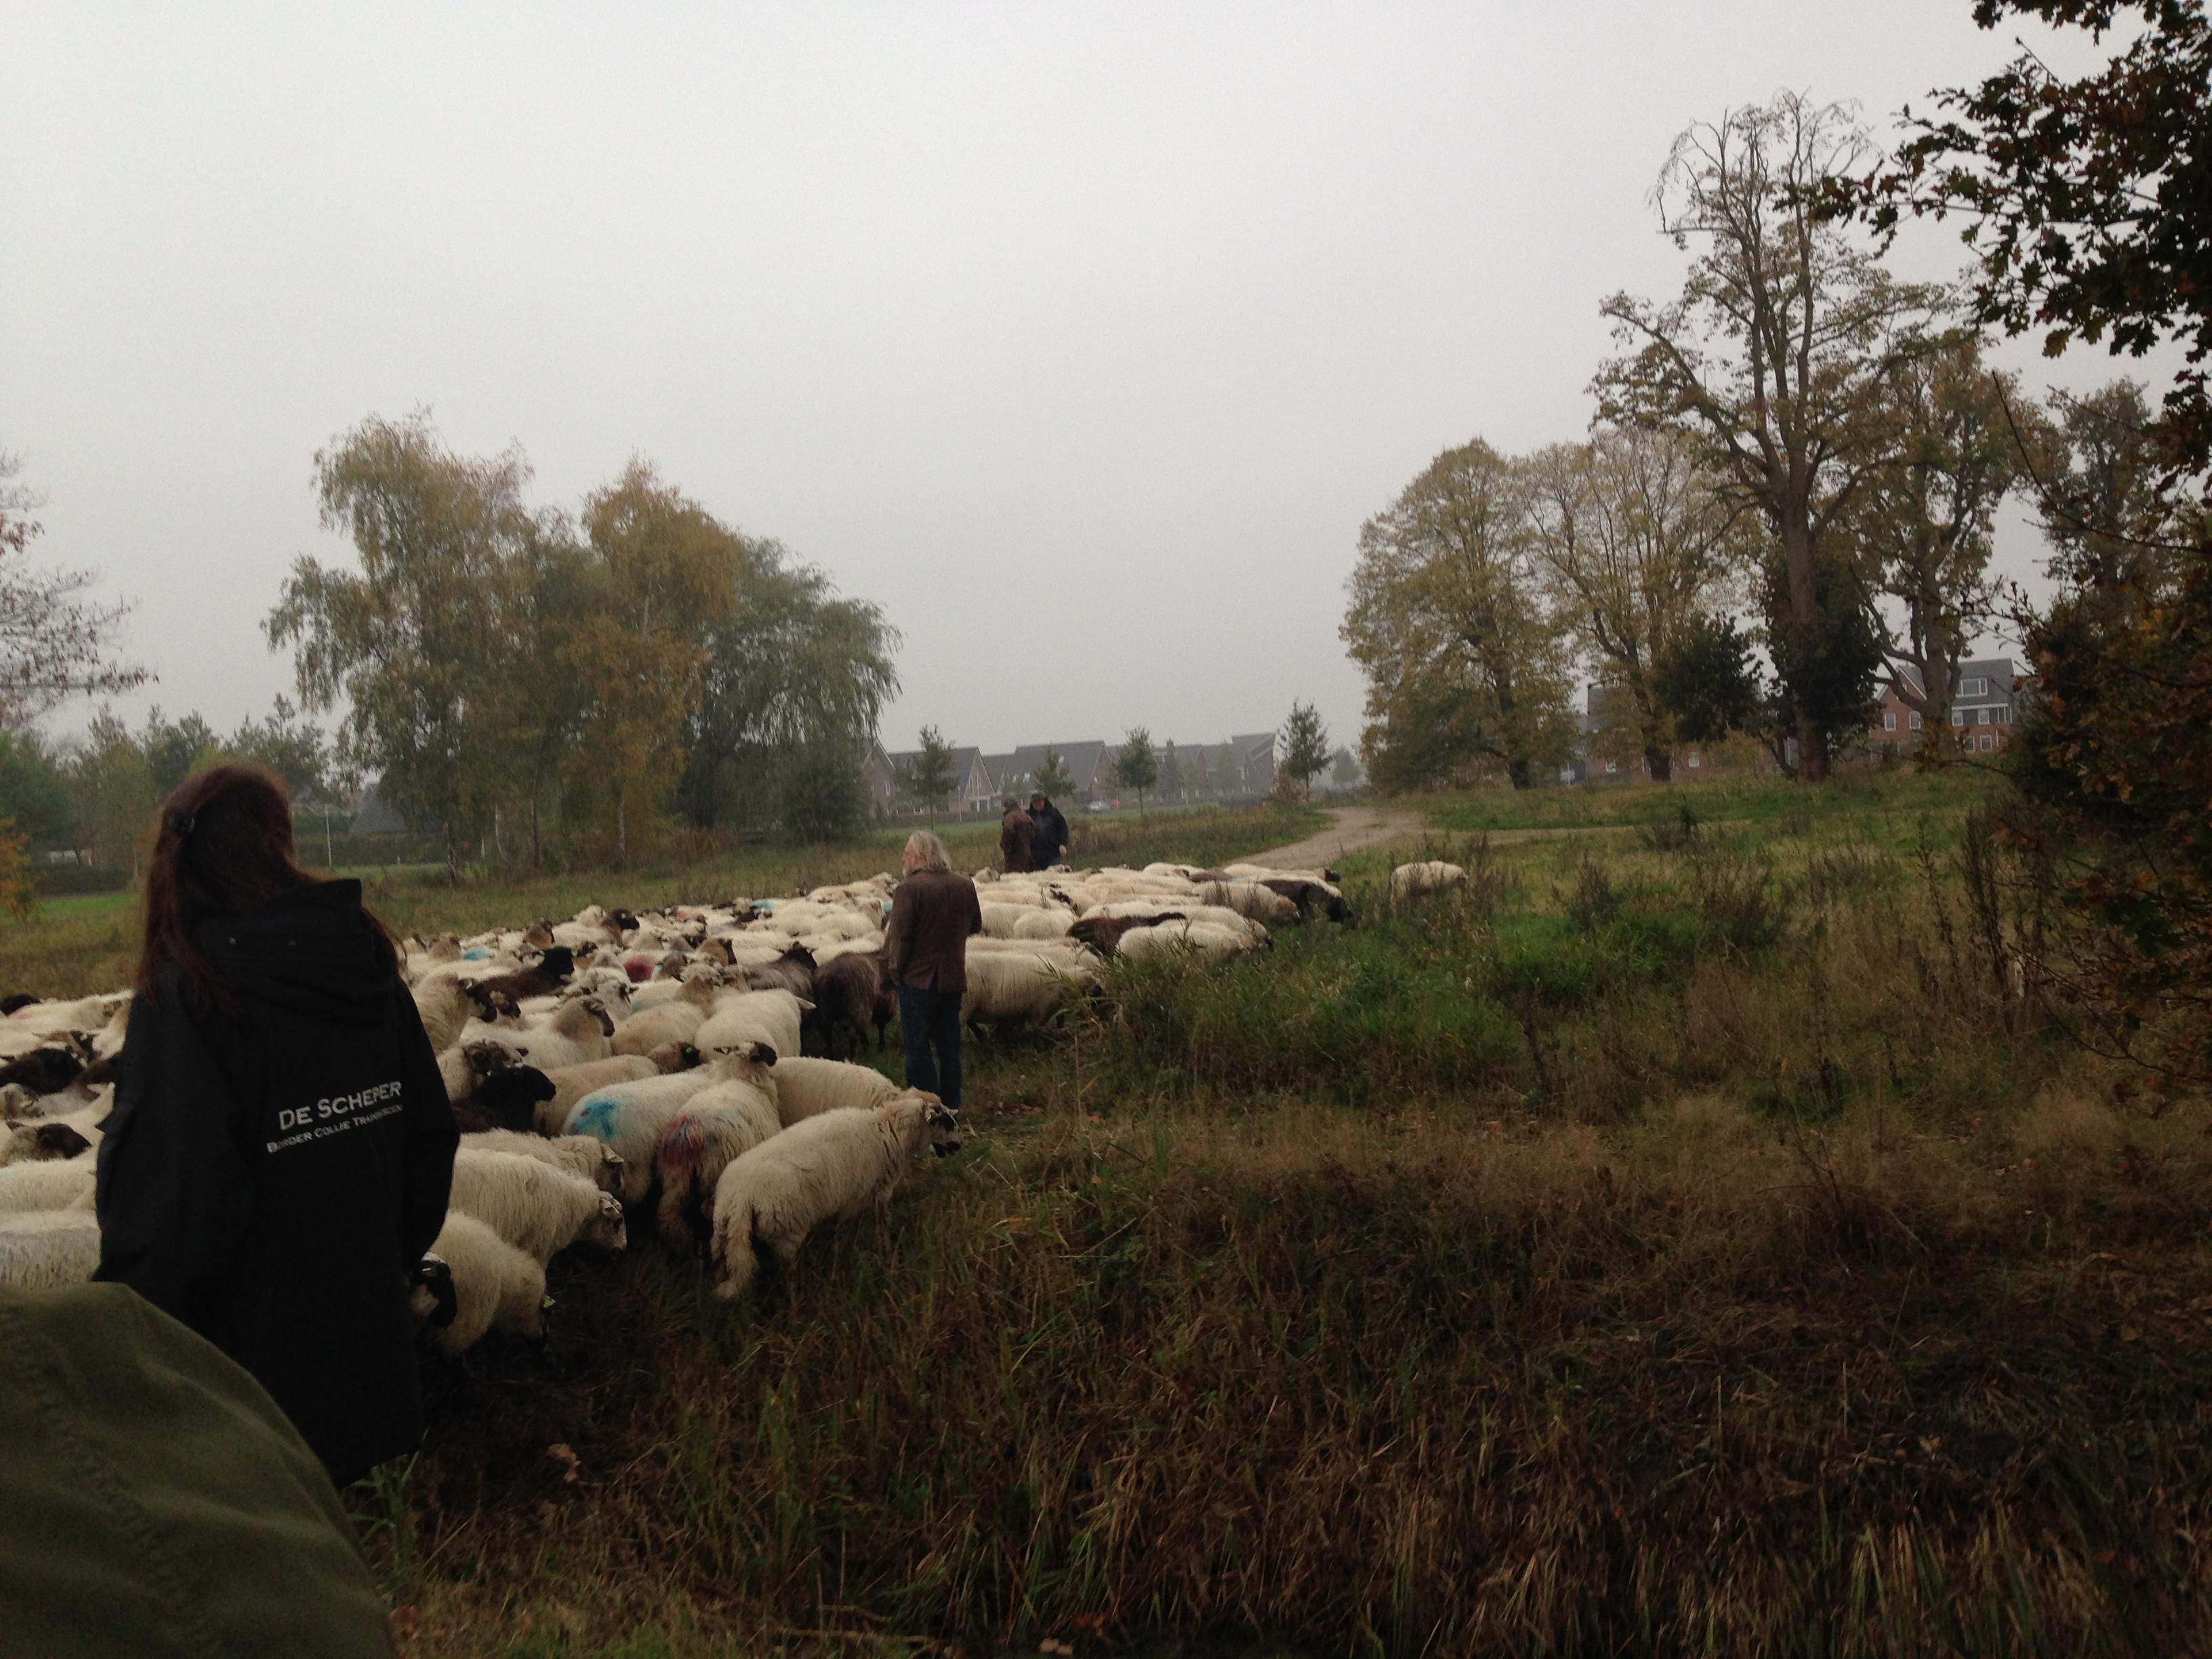 Photo of Zwolse schaapskudde vertrekt weer uit Stadshagen